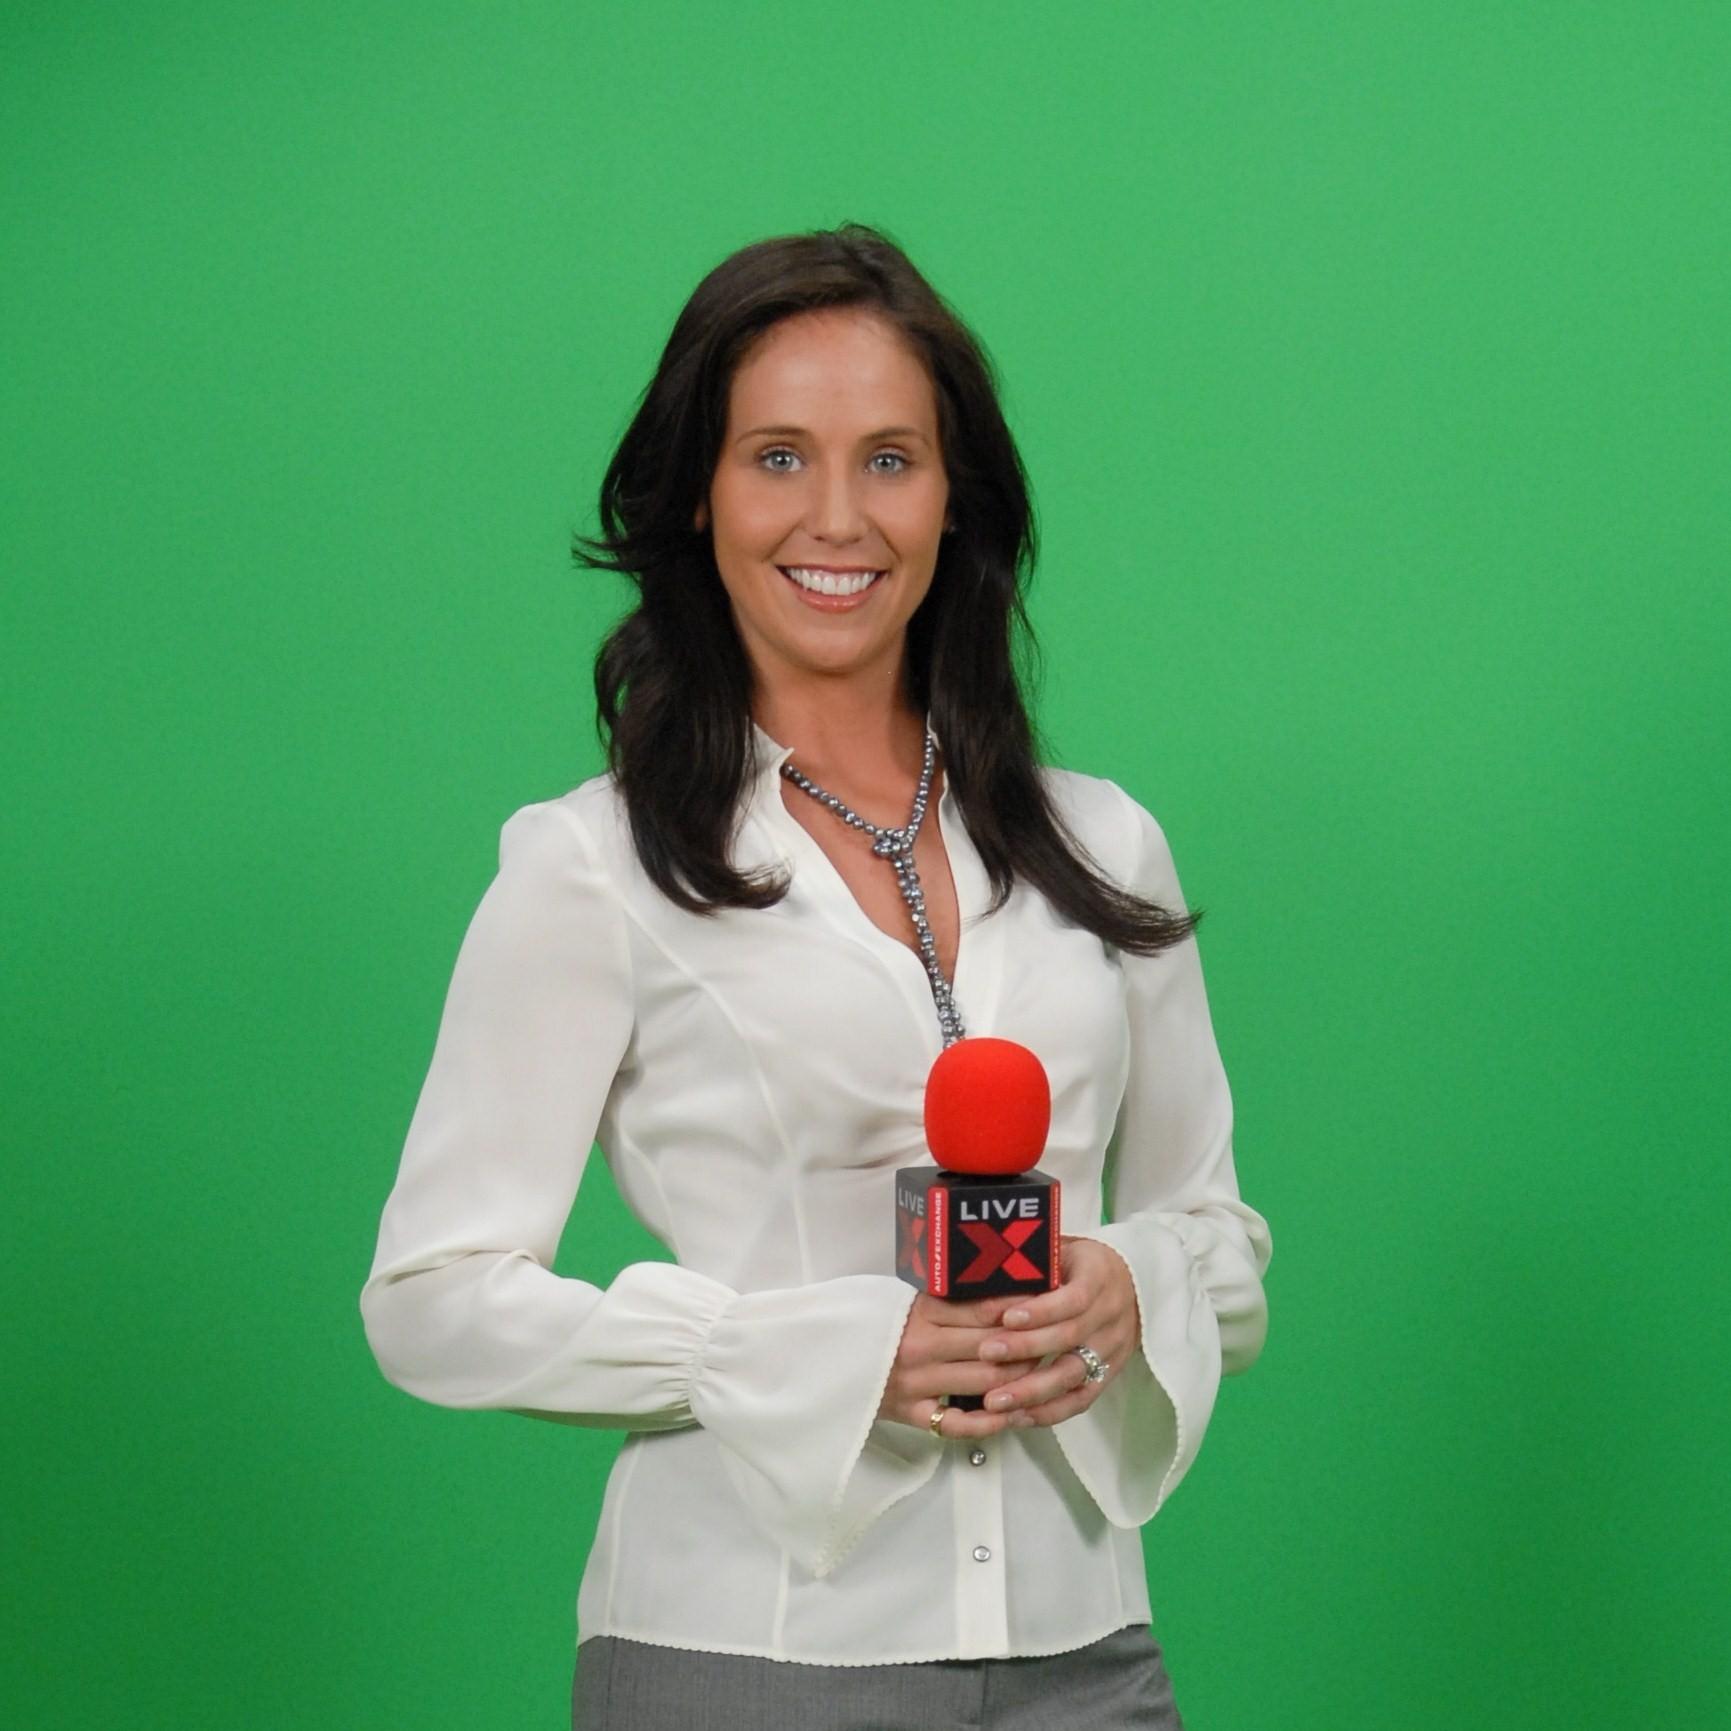 Jenni Croft, Former Phoenix Suns Dancer and ABC's 'The